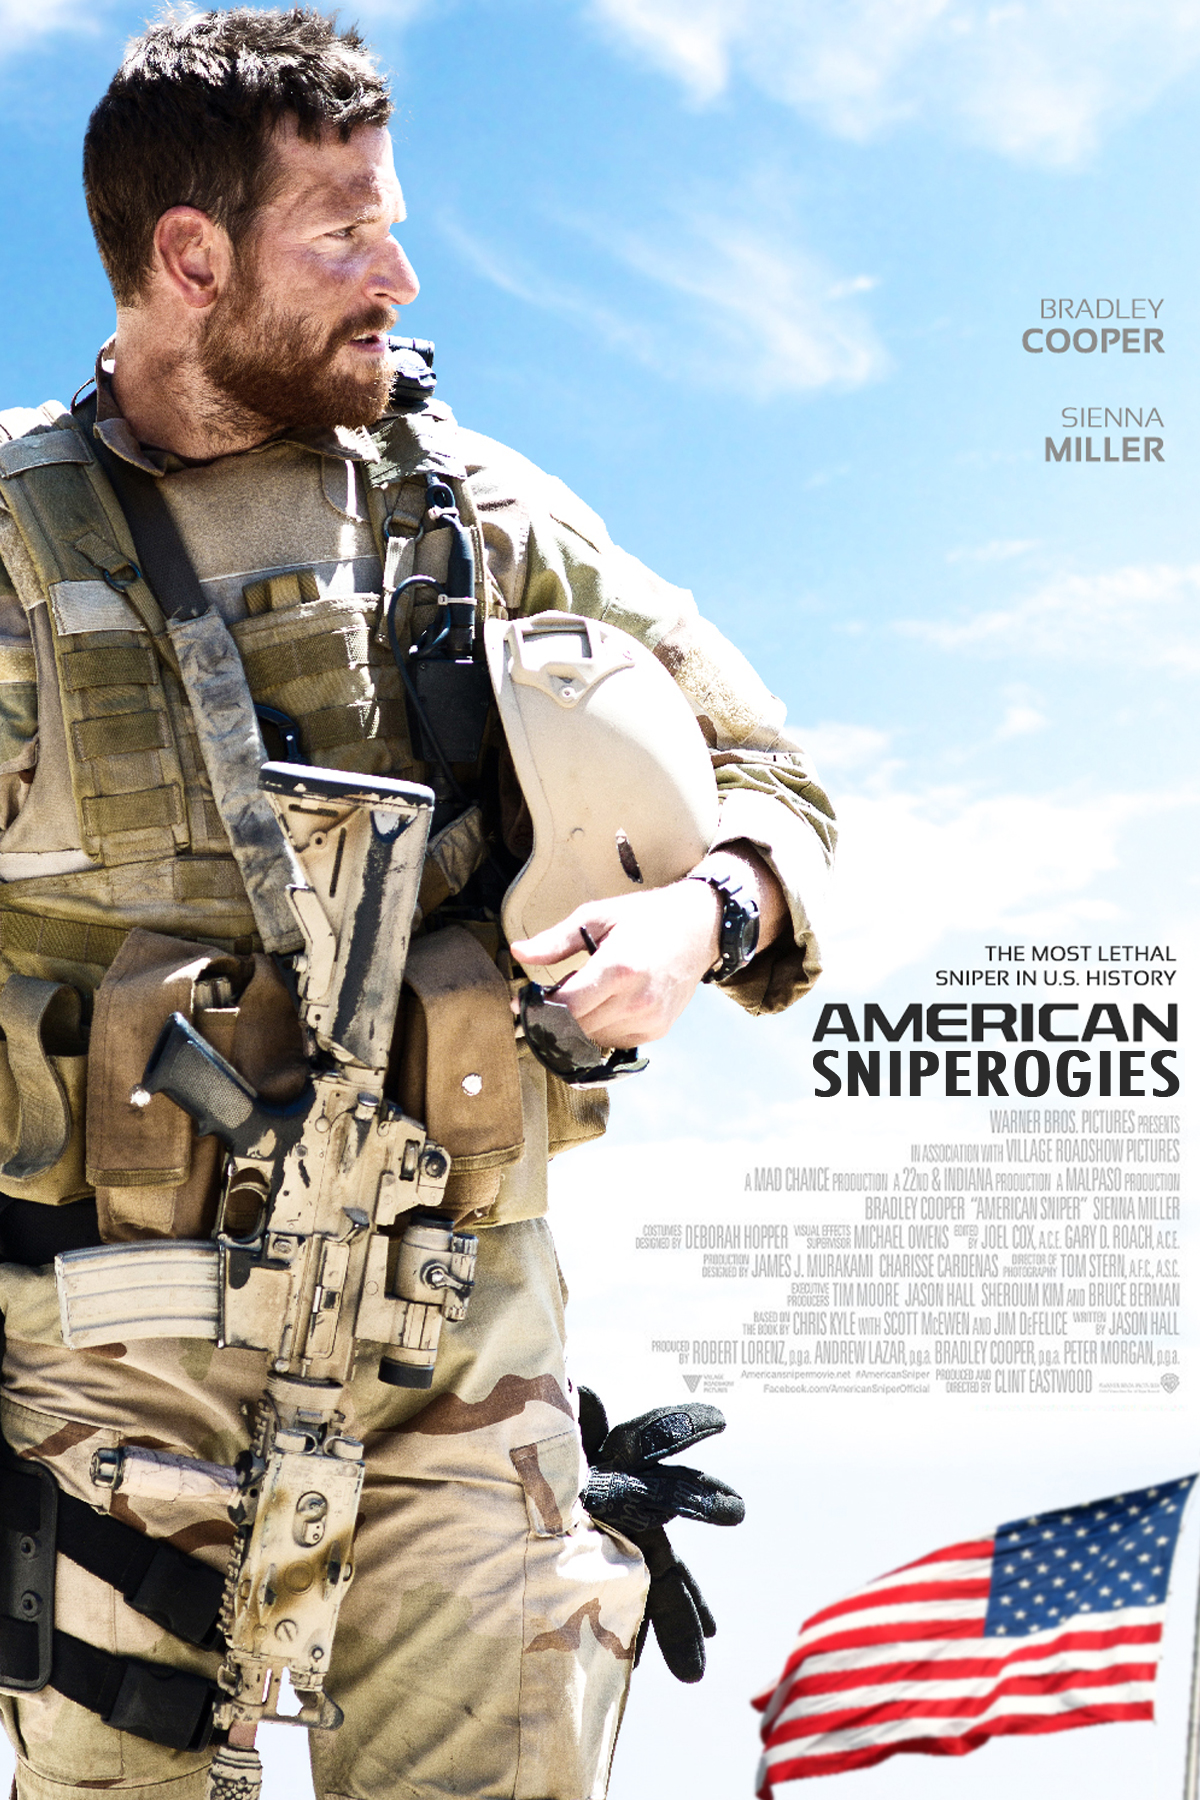 American Sniperogies